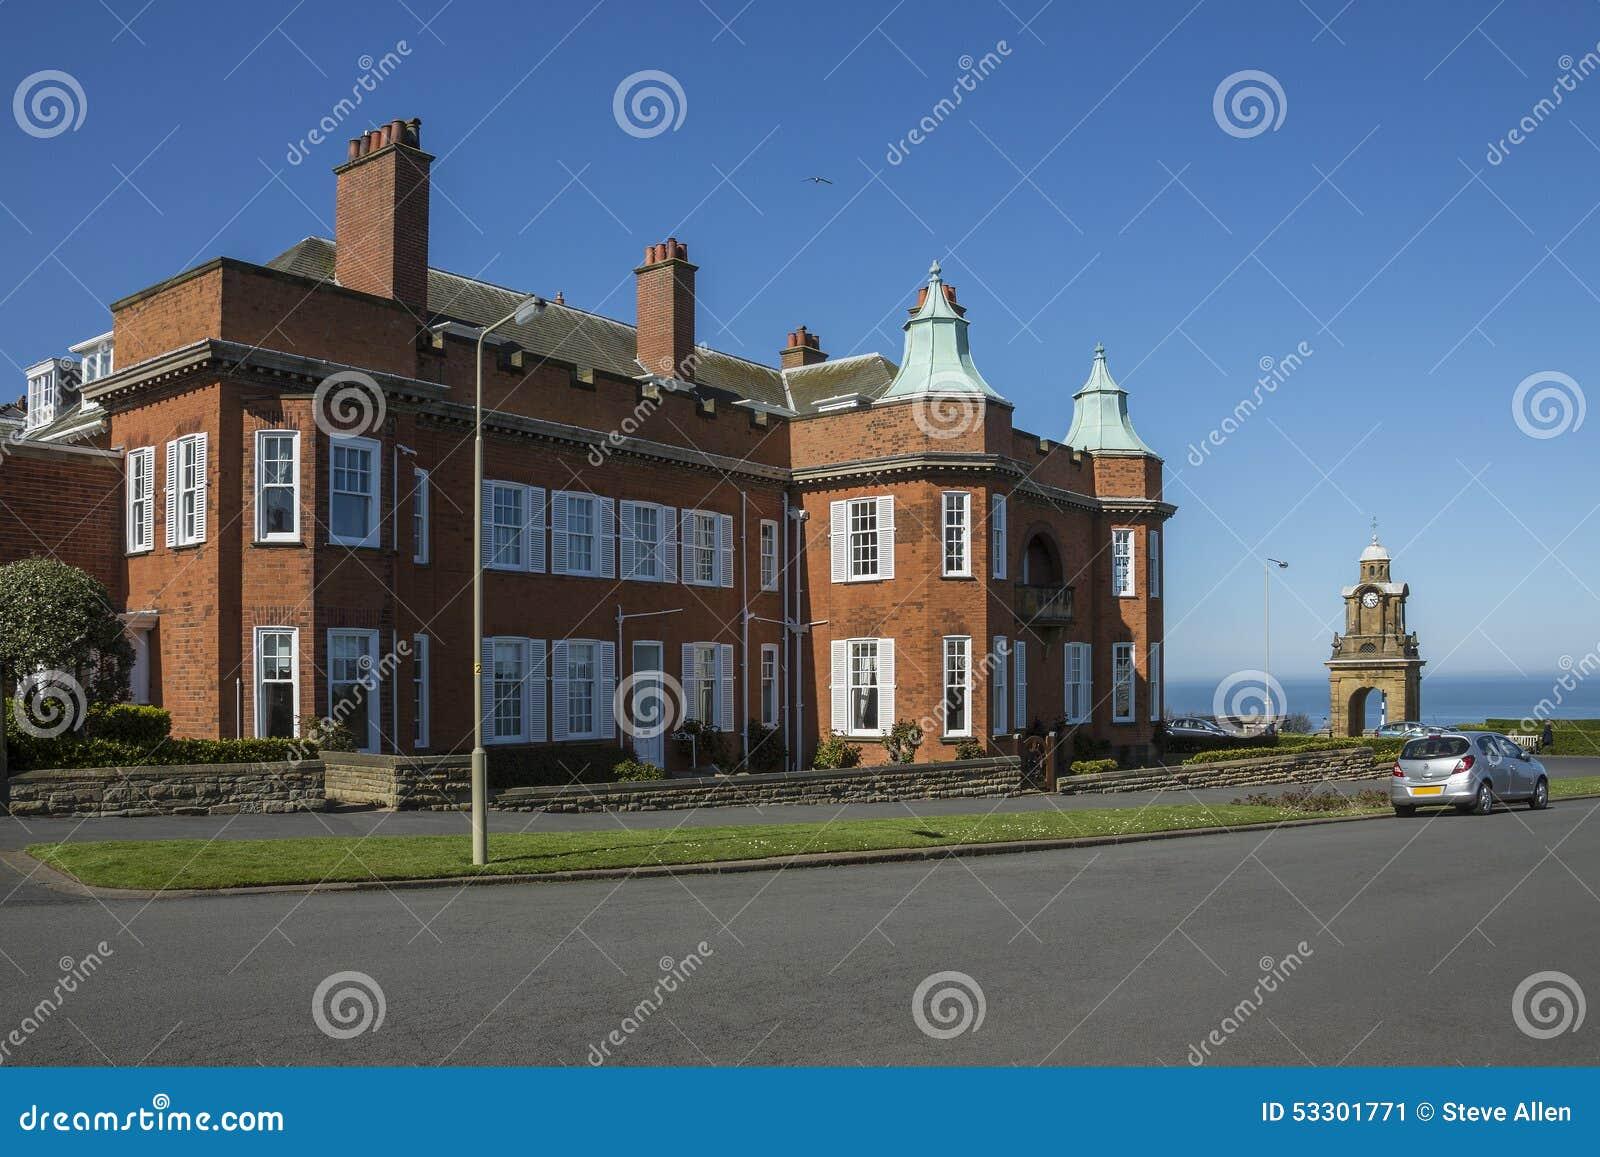 TV Location - The Royal - British TV Program Editorial Photo